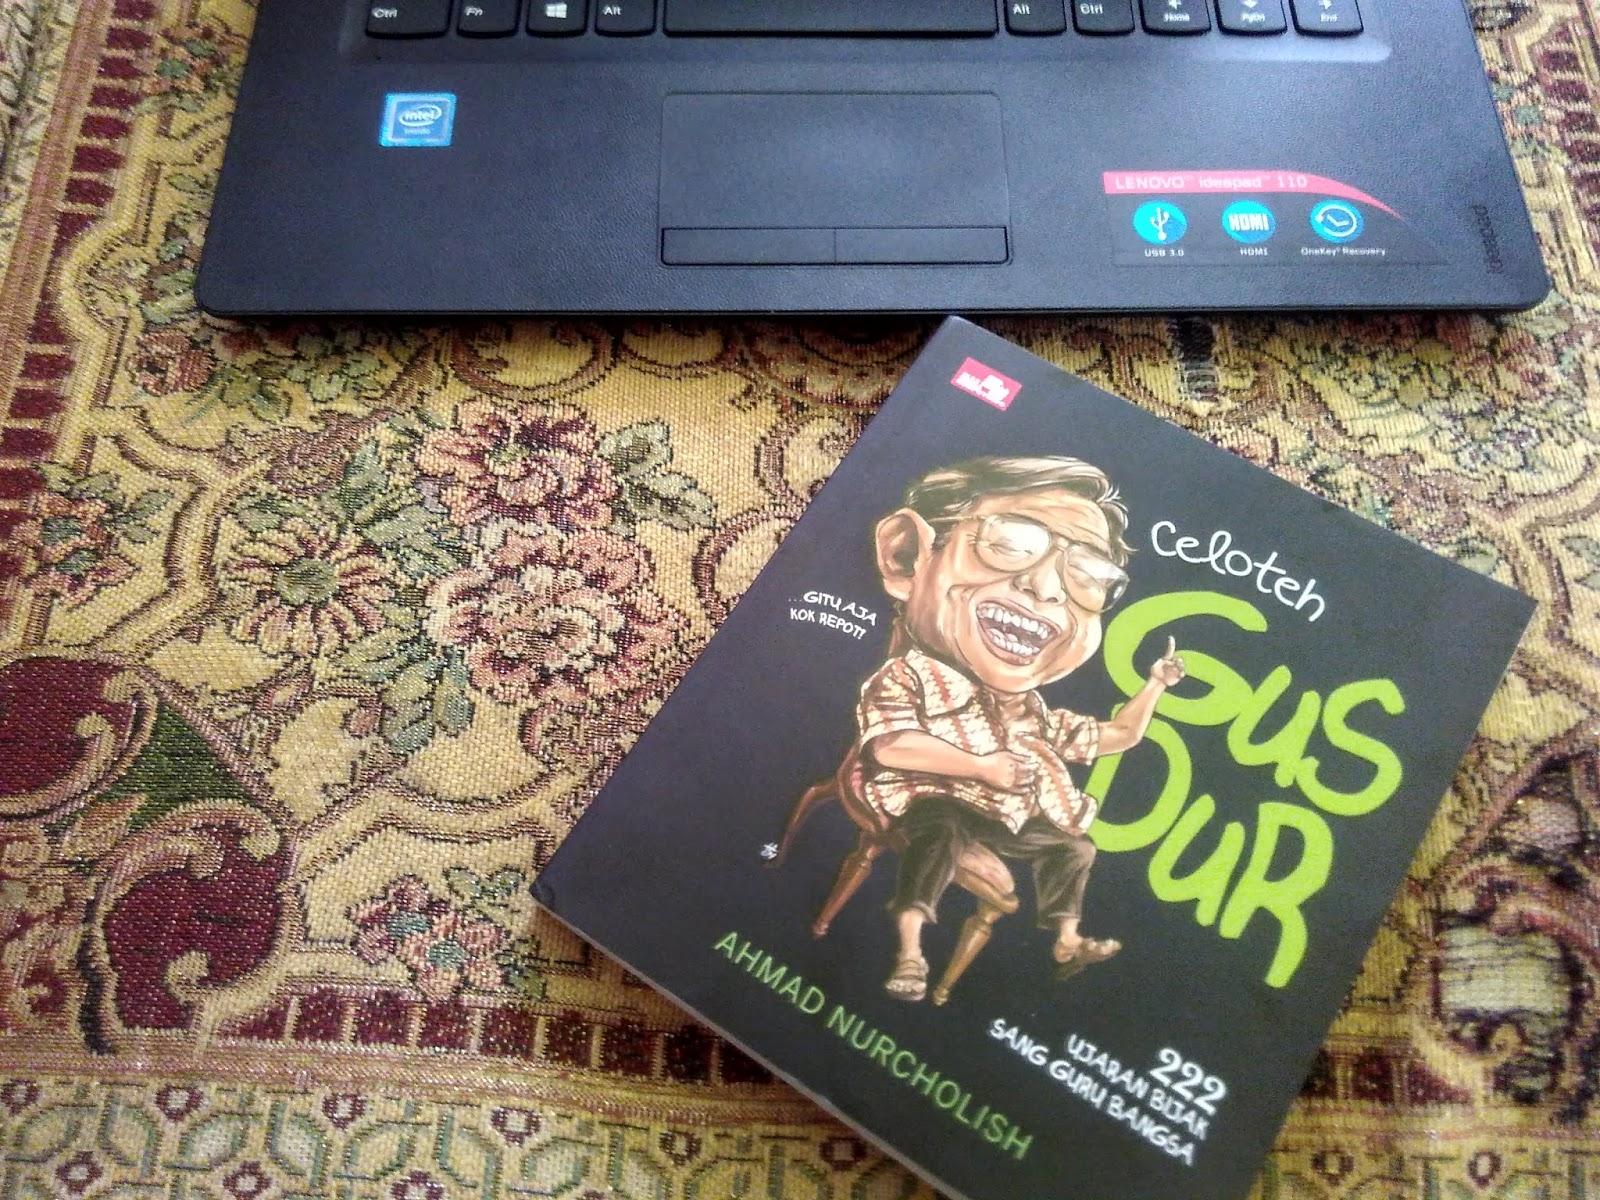 Review Buku Celoteh Gus Dur by Ahmad Nurcholis